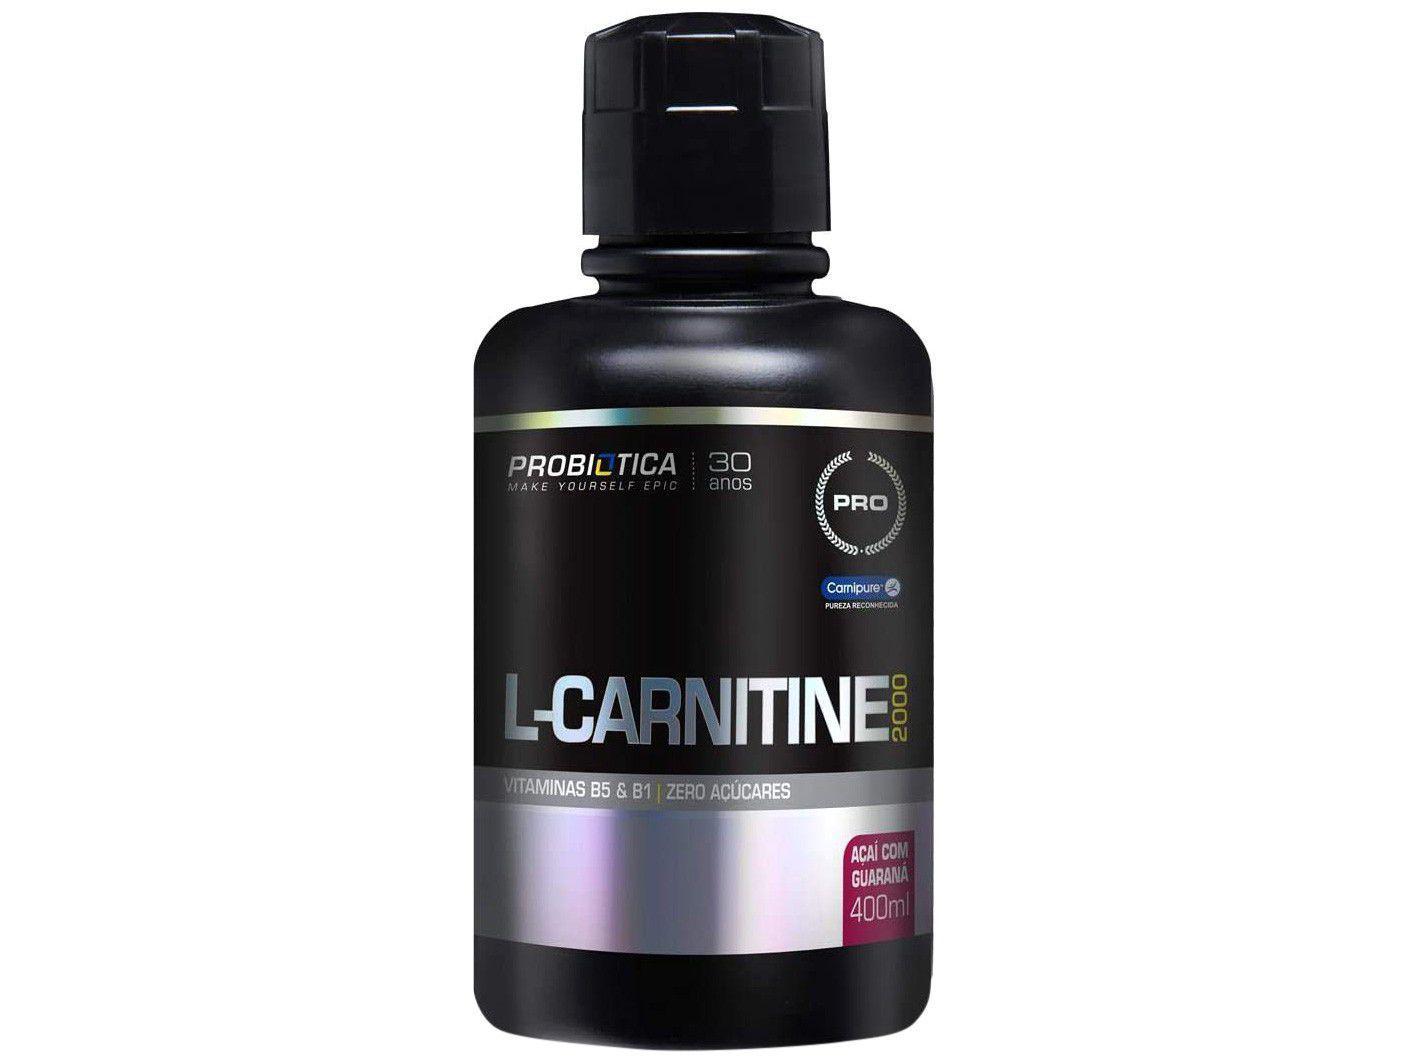 L-Carnitina Probiotica 2000 Líquido 400ml - Açaí com Guaraná